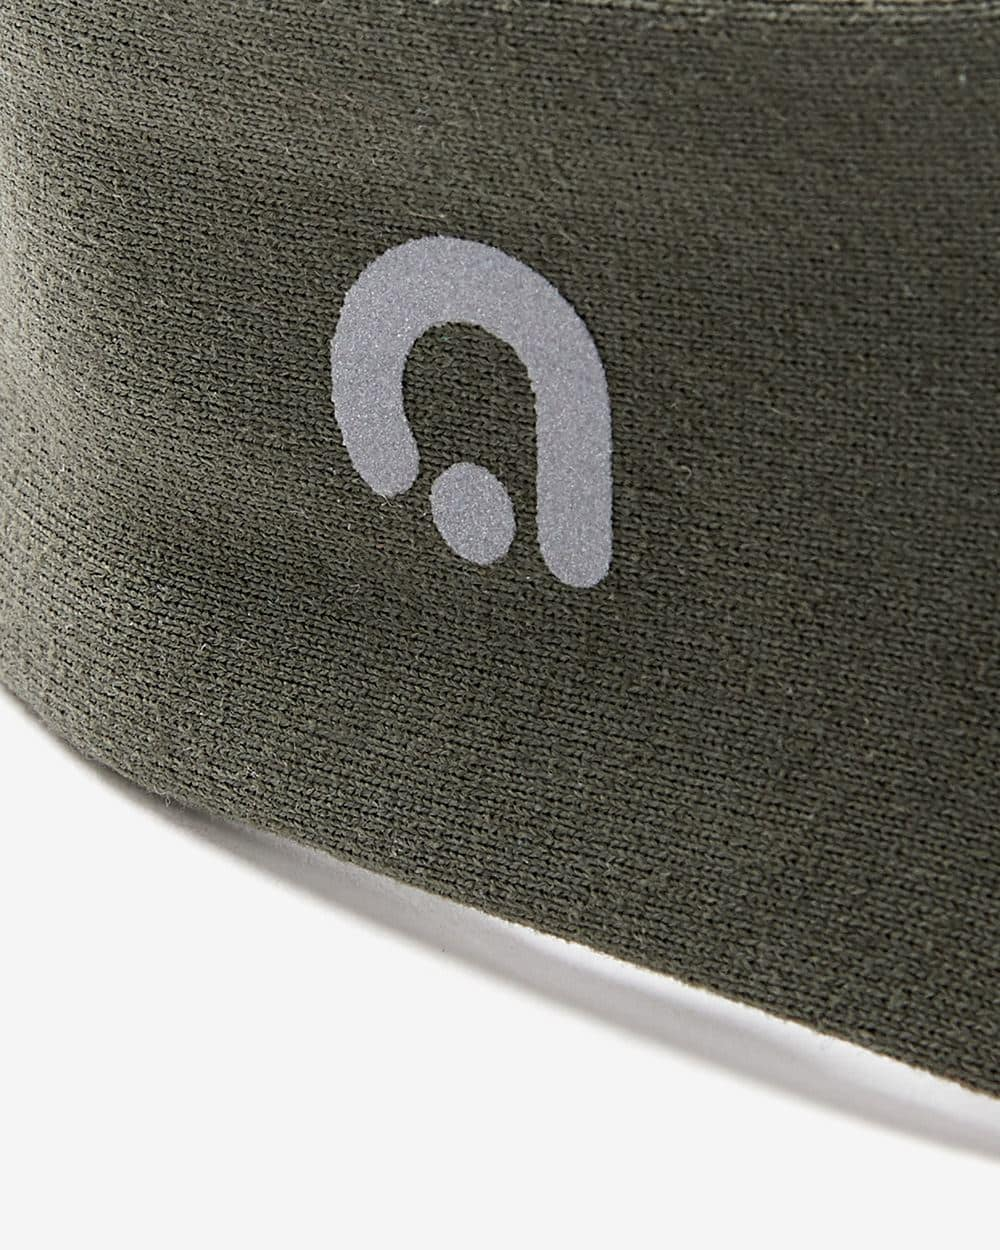 Hyba Two-Strap Printed Headband